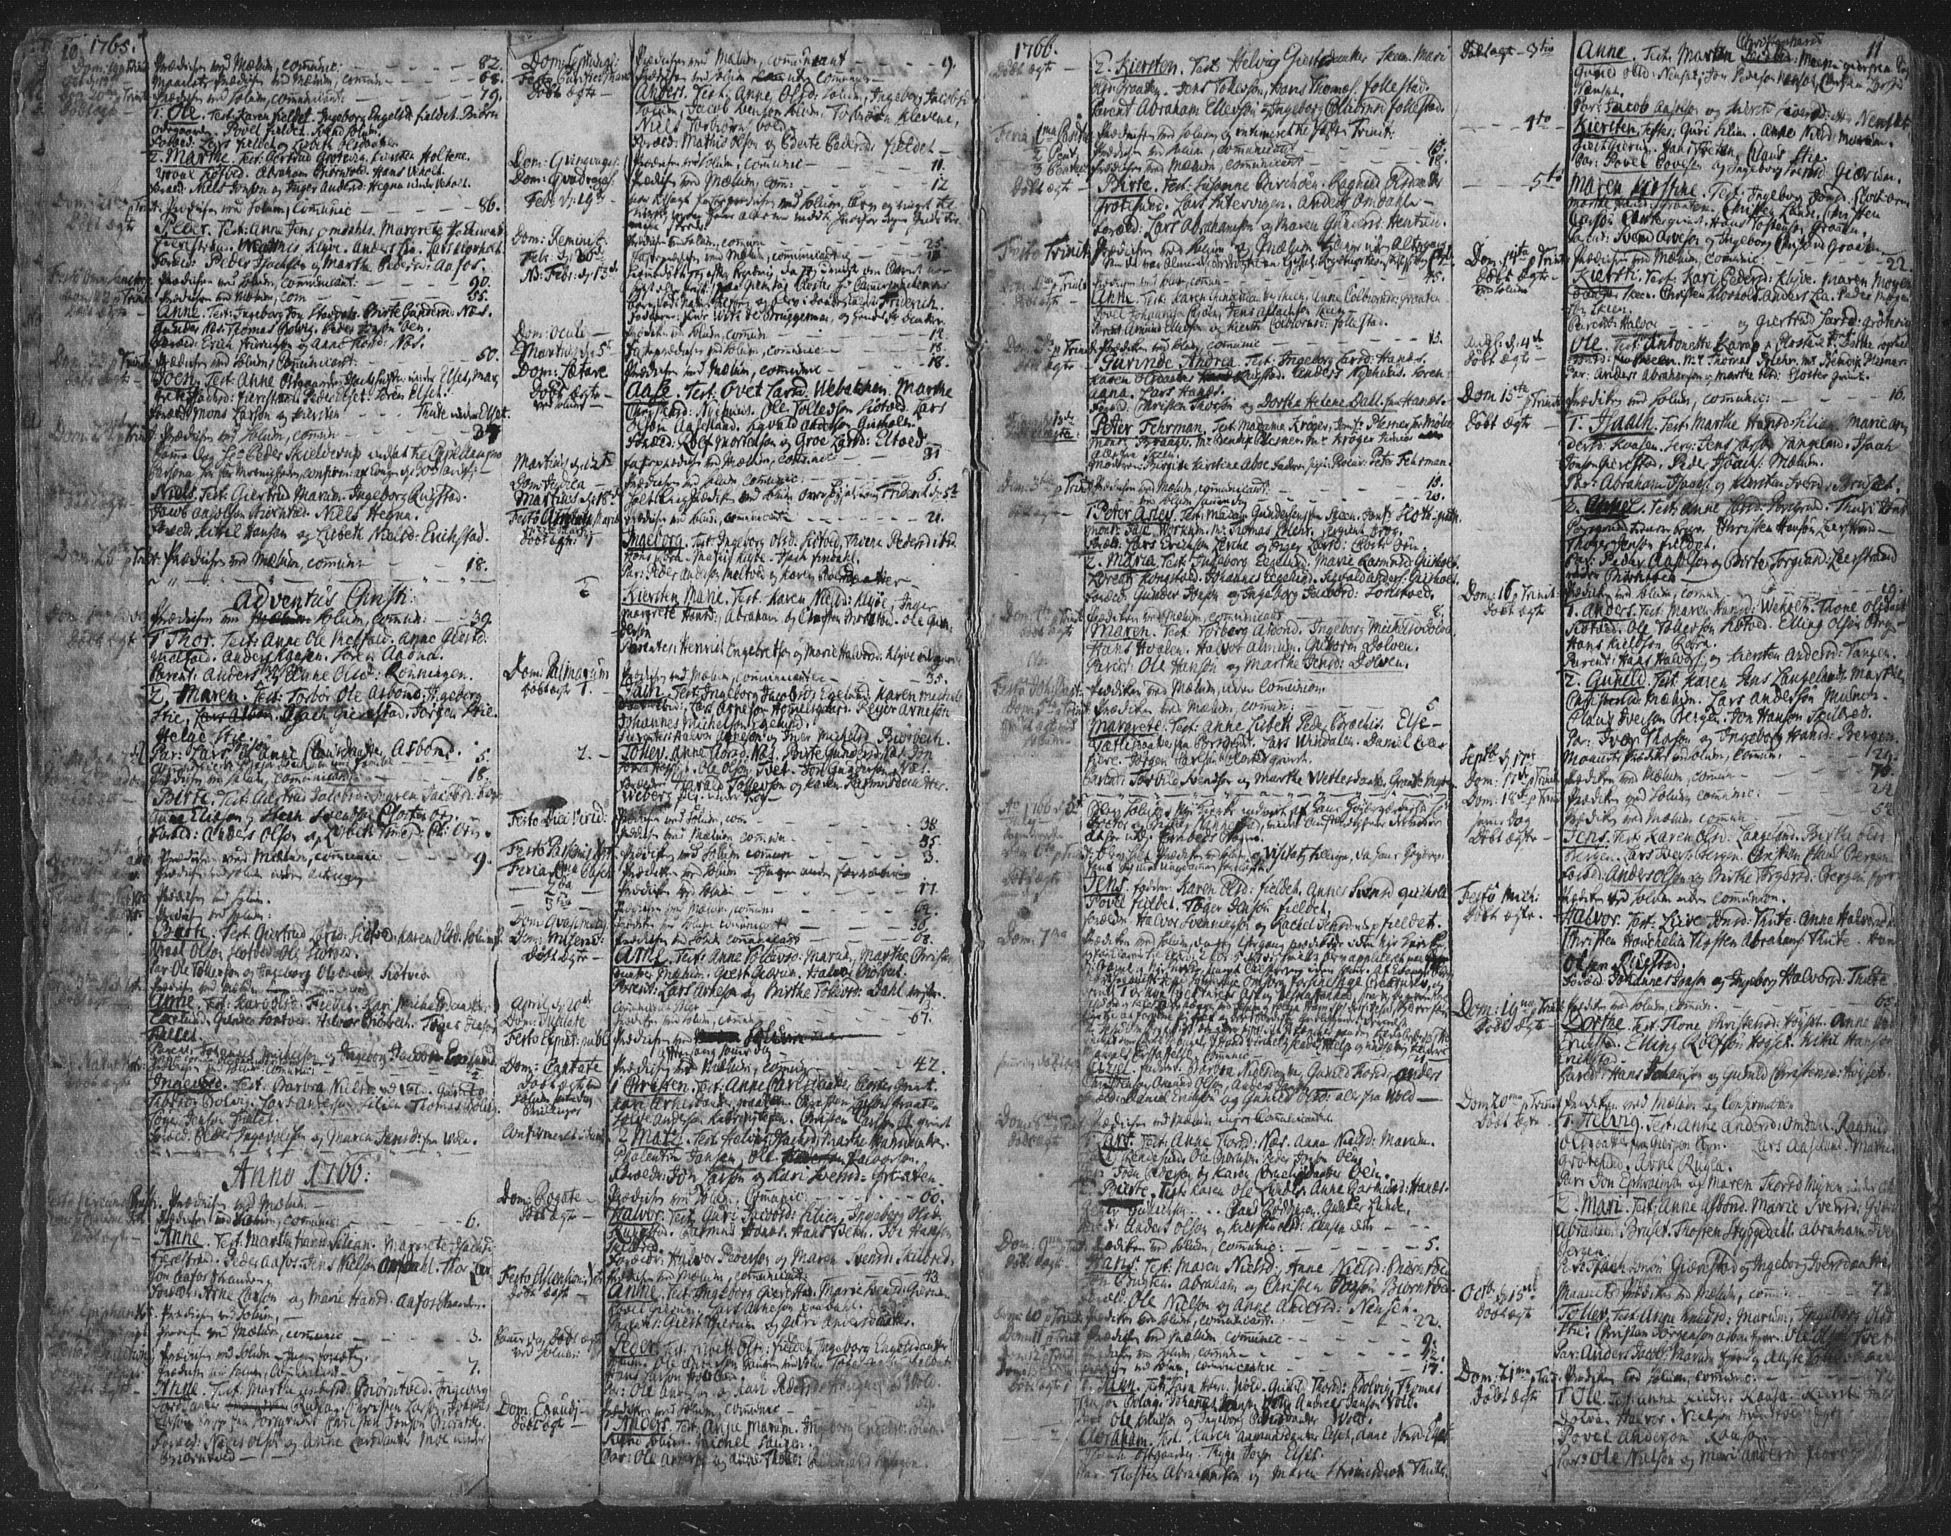 SAKO, Solum kirkebøker, F/Fa/L0003: Ministerialbok nr. I 3, 1761-1814, s. 10-11